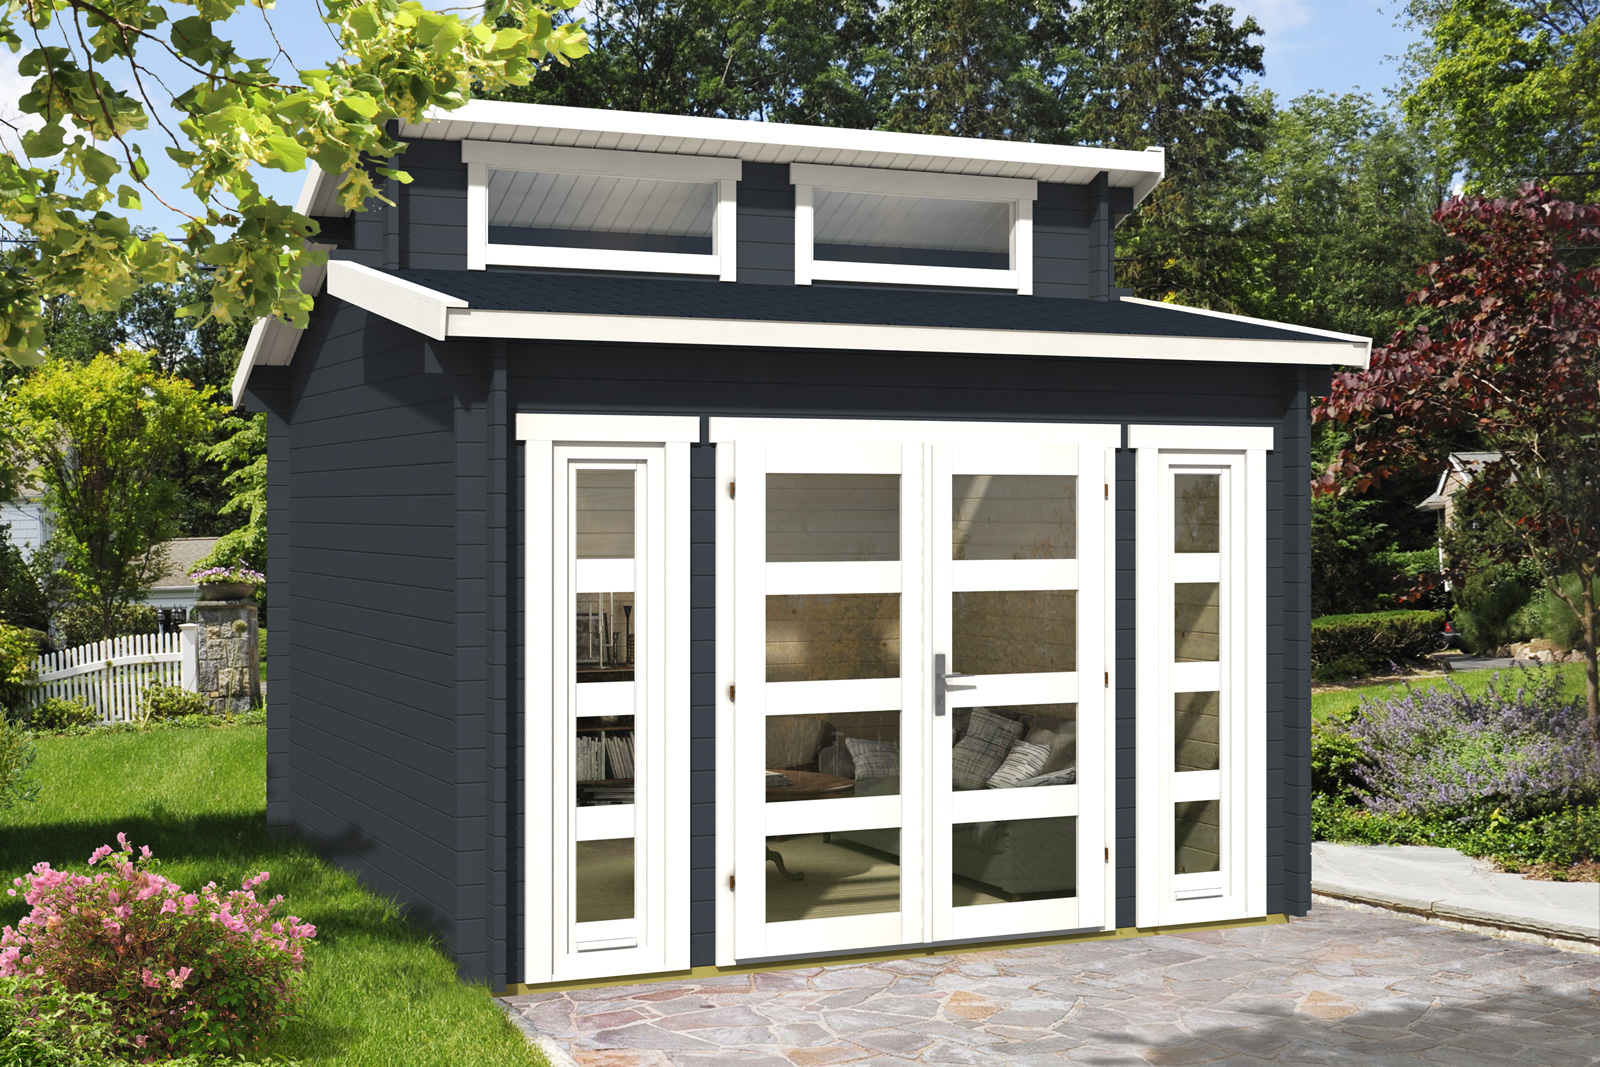 doppel pultdach gartenhaus modell vinea 40. Black Bedroom Furniture Sets. Home Design Ideas